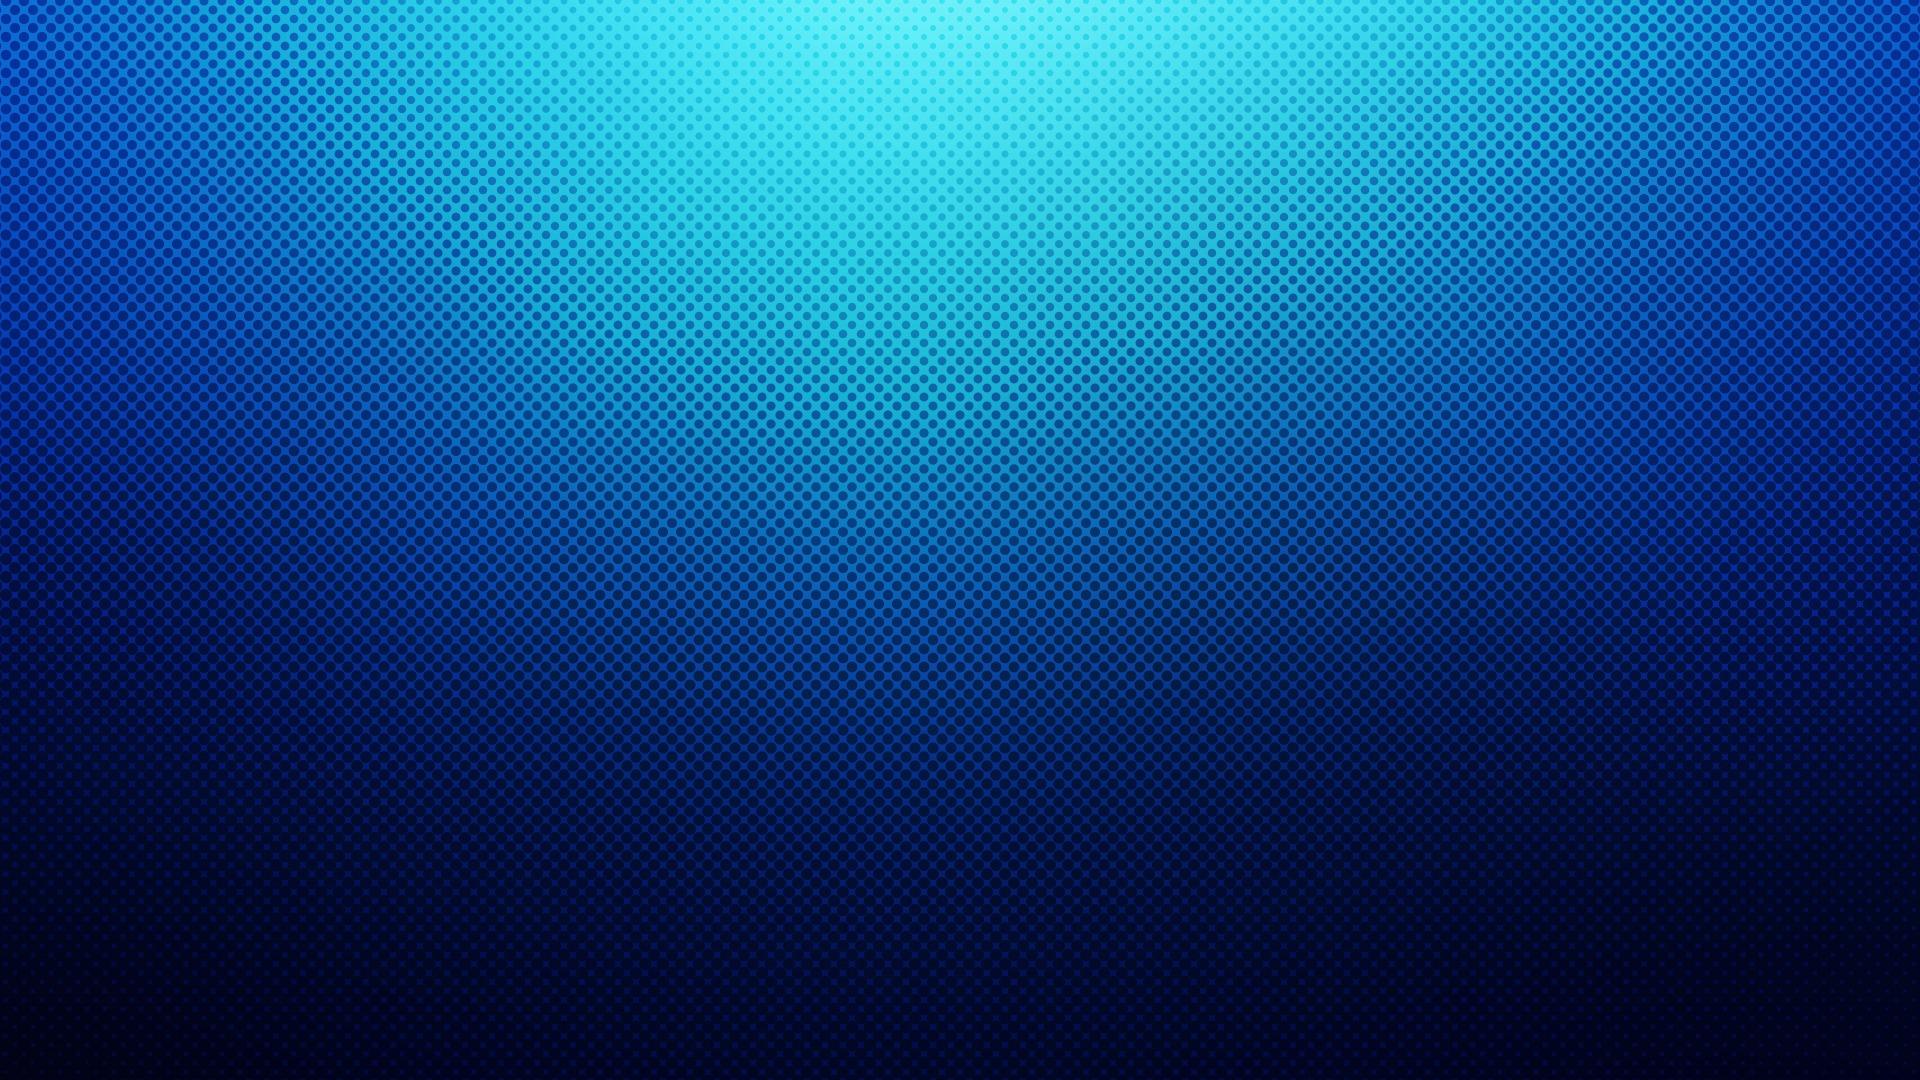 Blue Gradient Background HD Wallpaper GSEII VISION 2030 1920x1080